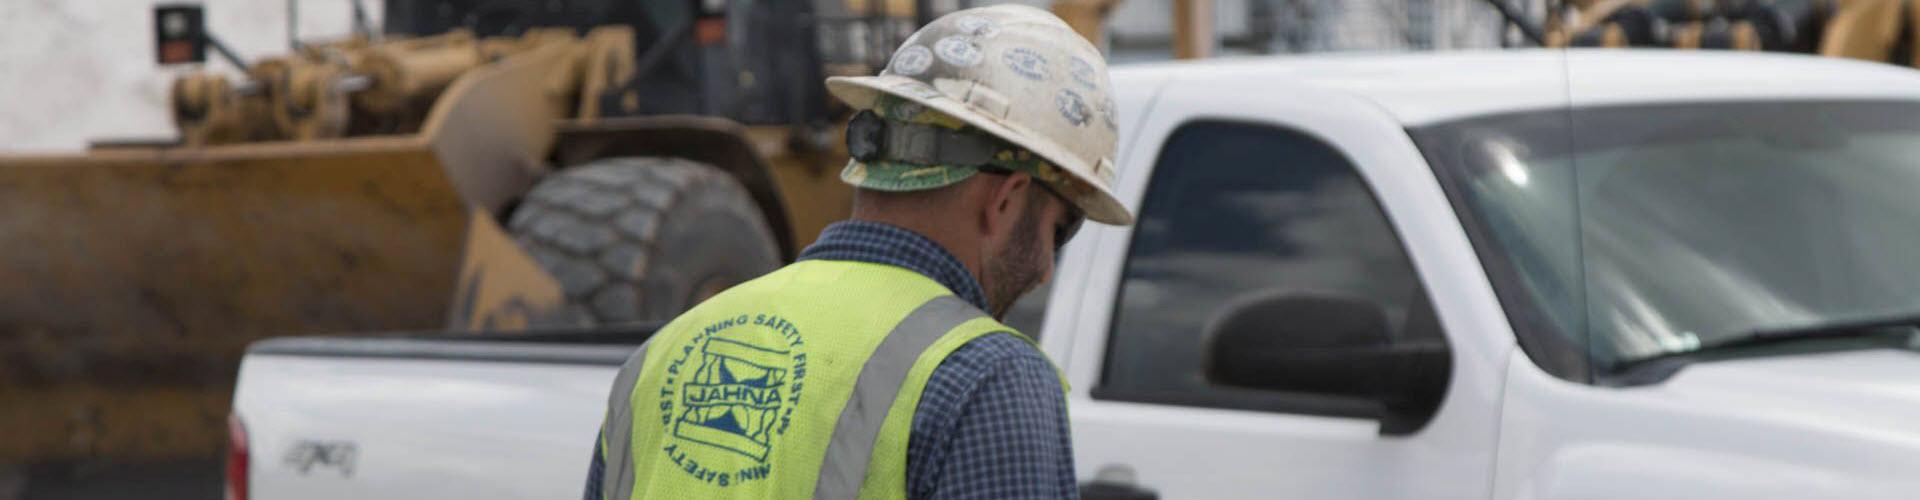 banner safety hard hat